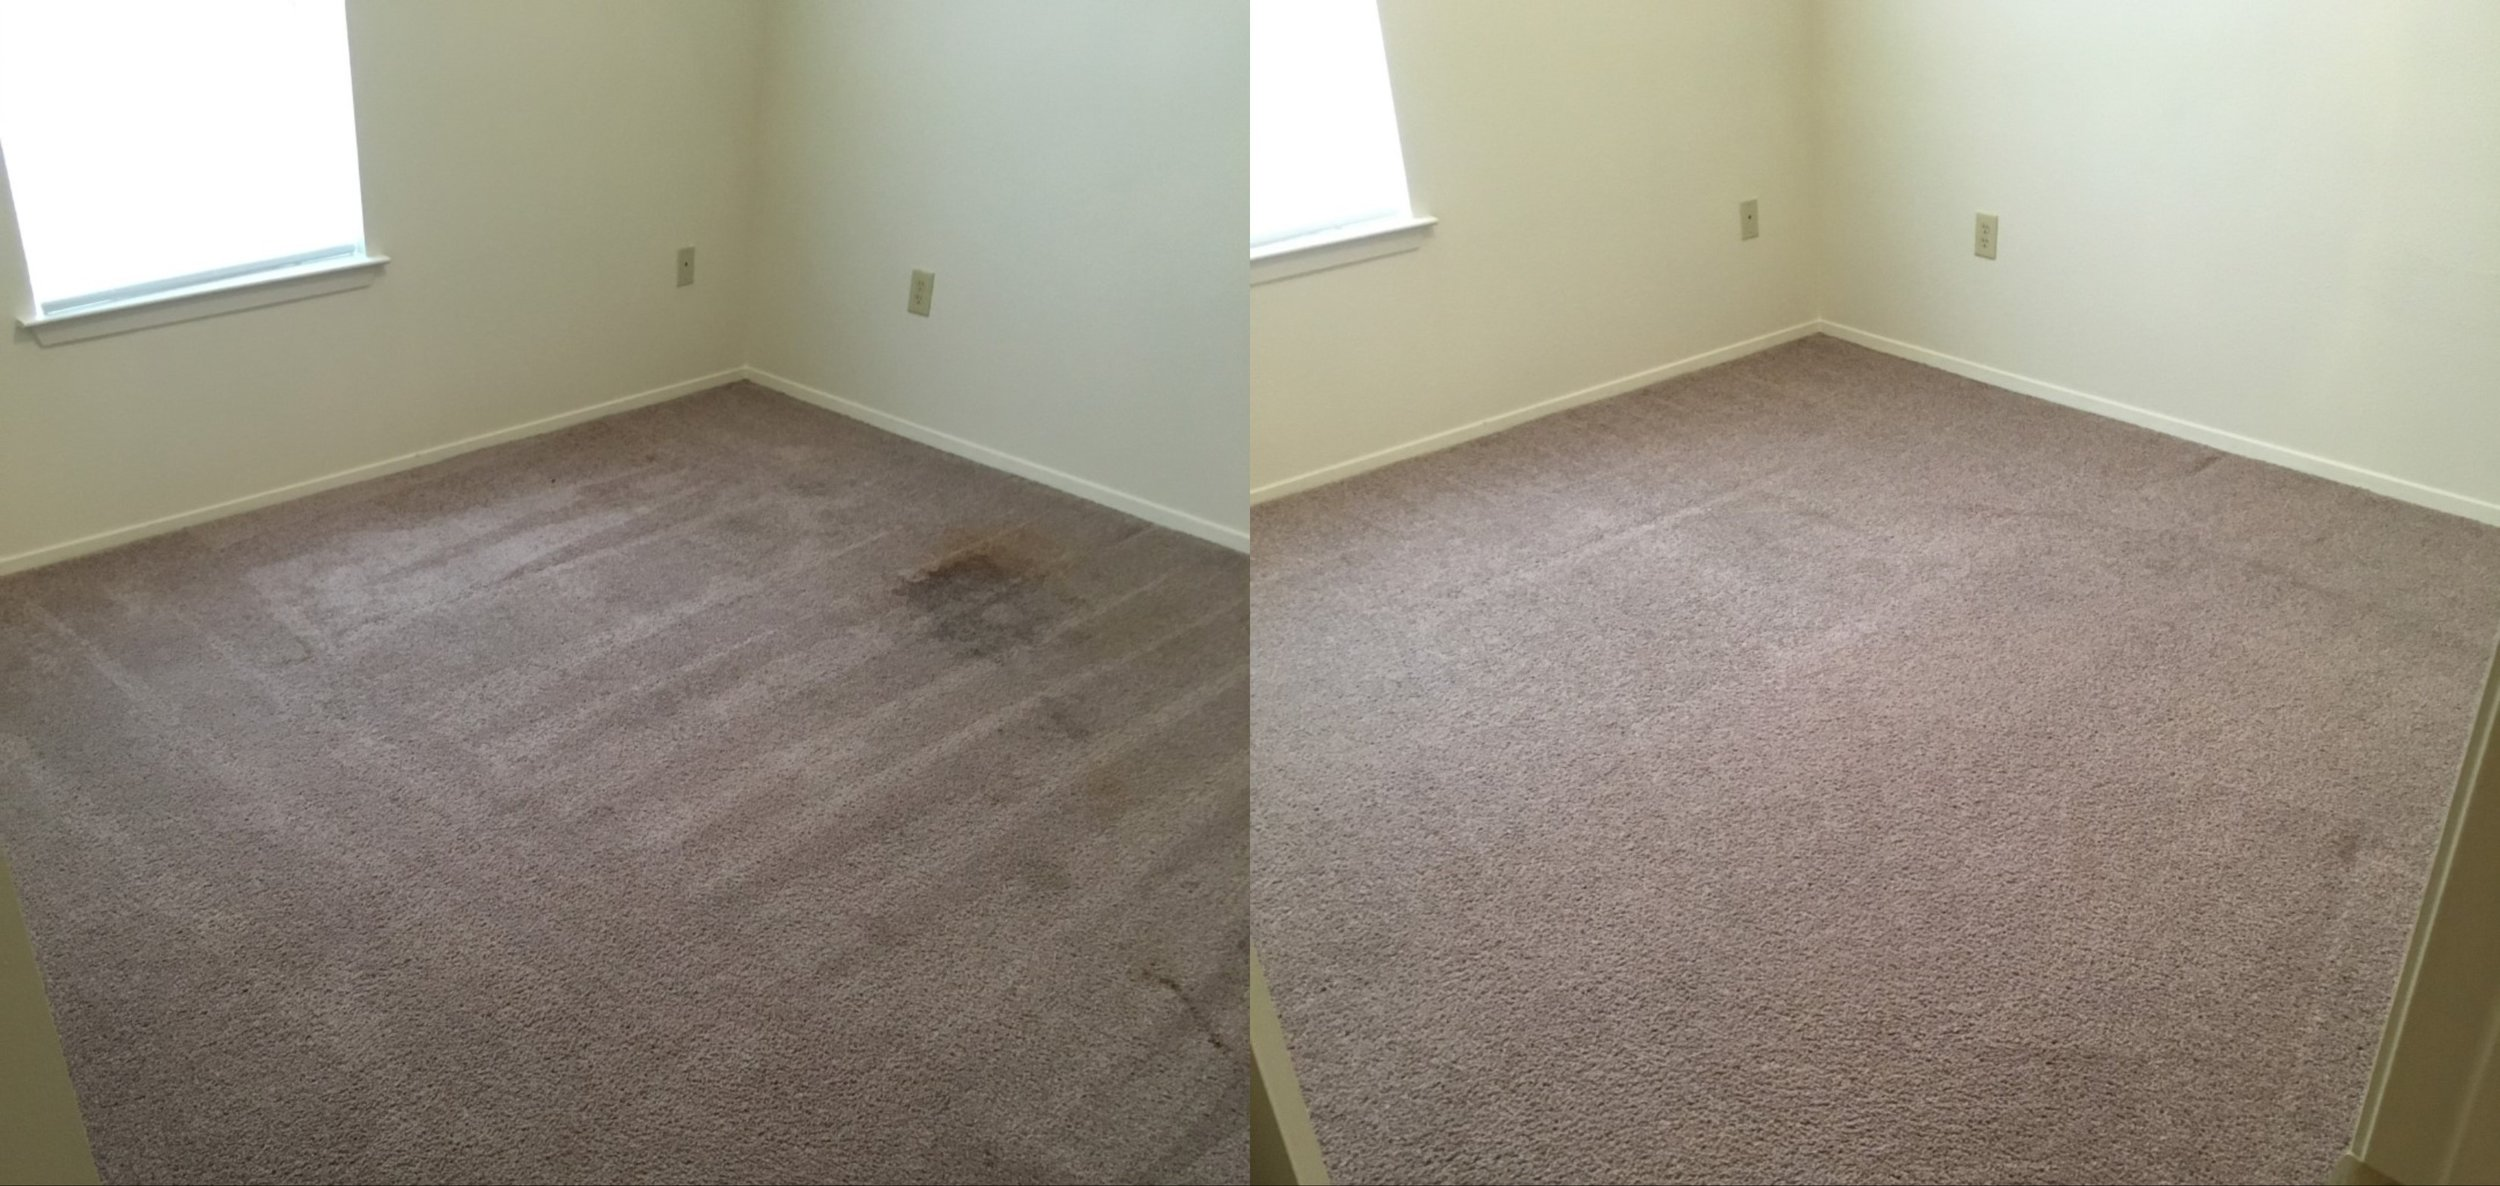 carpetb4after.jpg